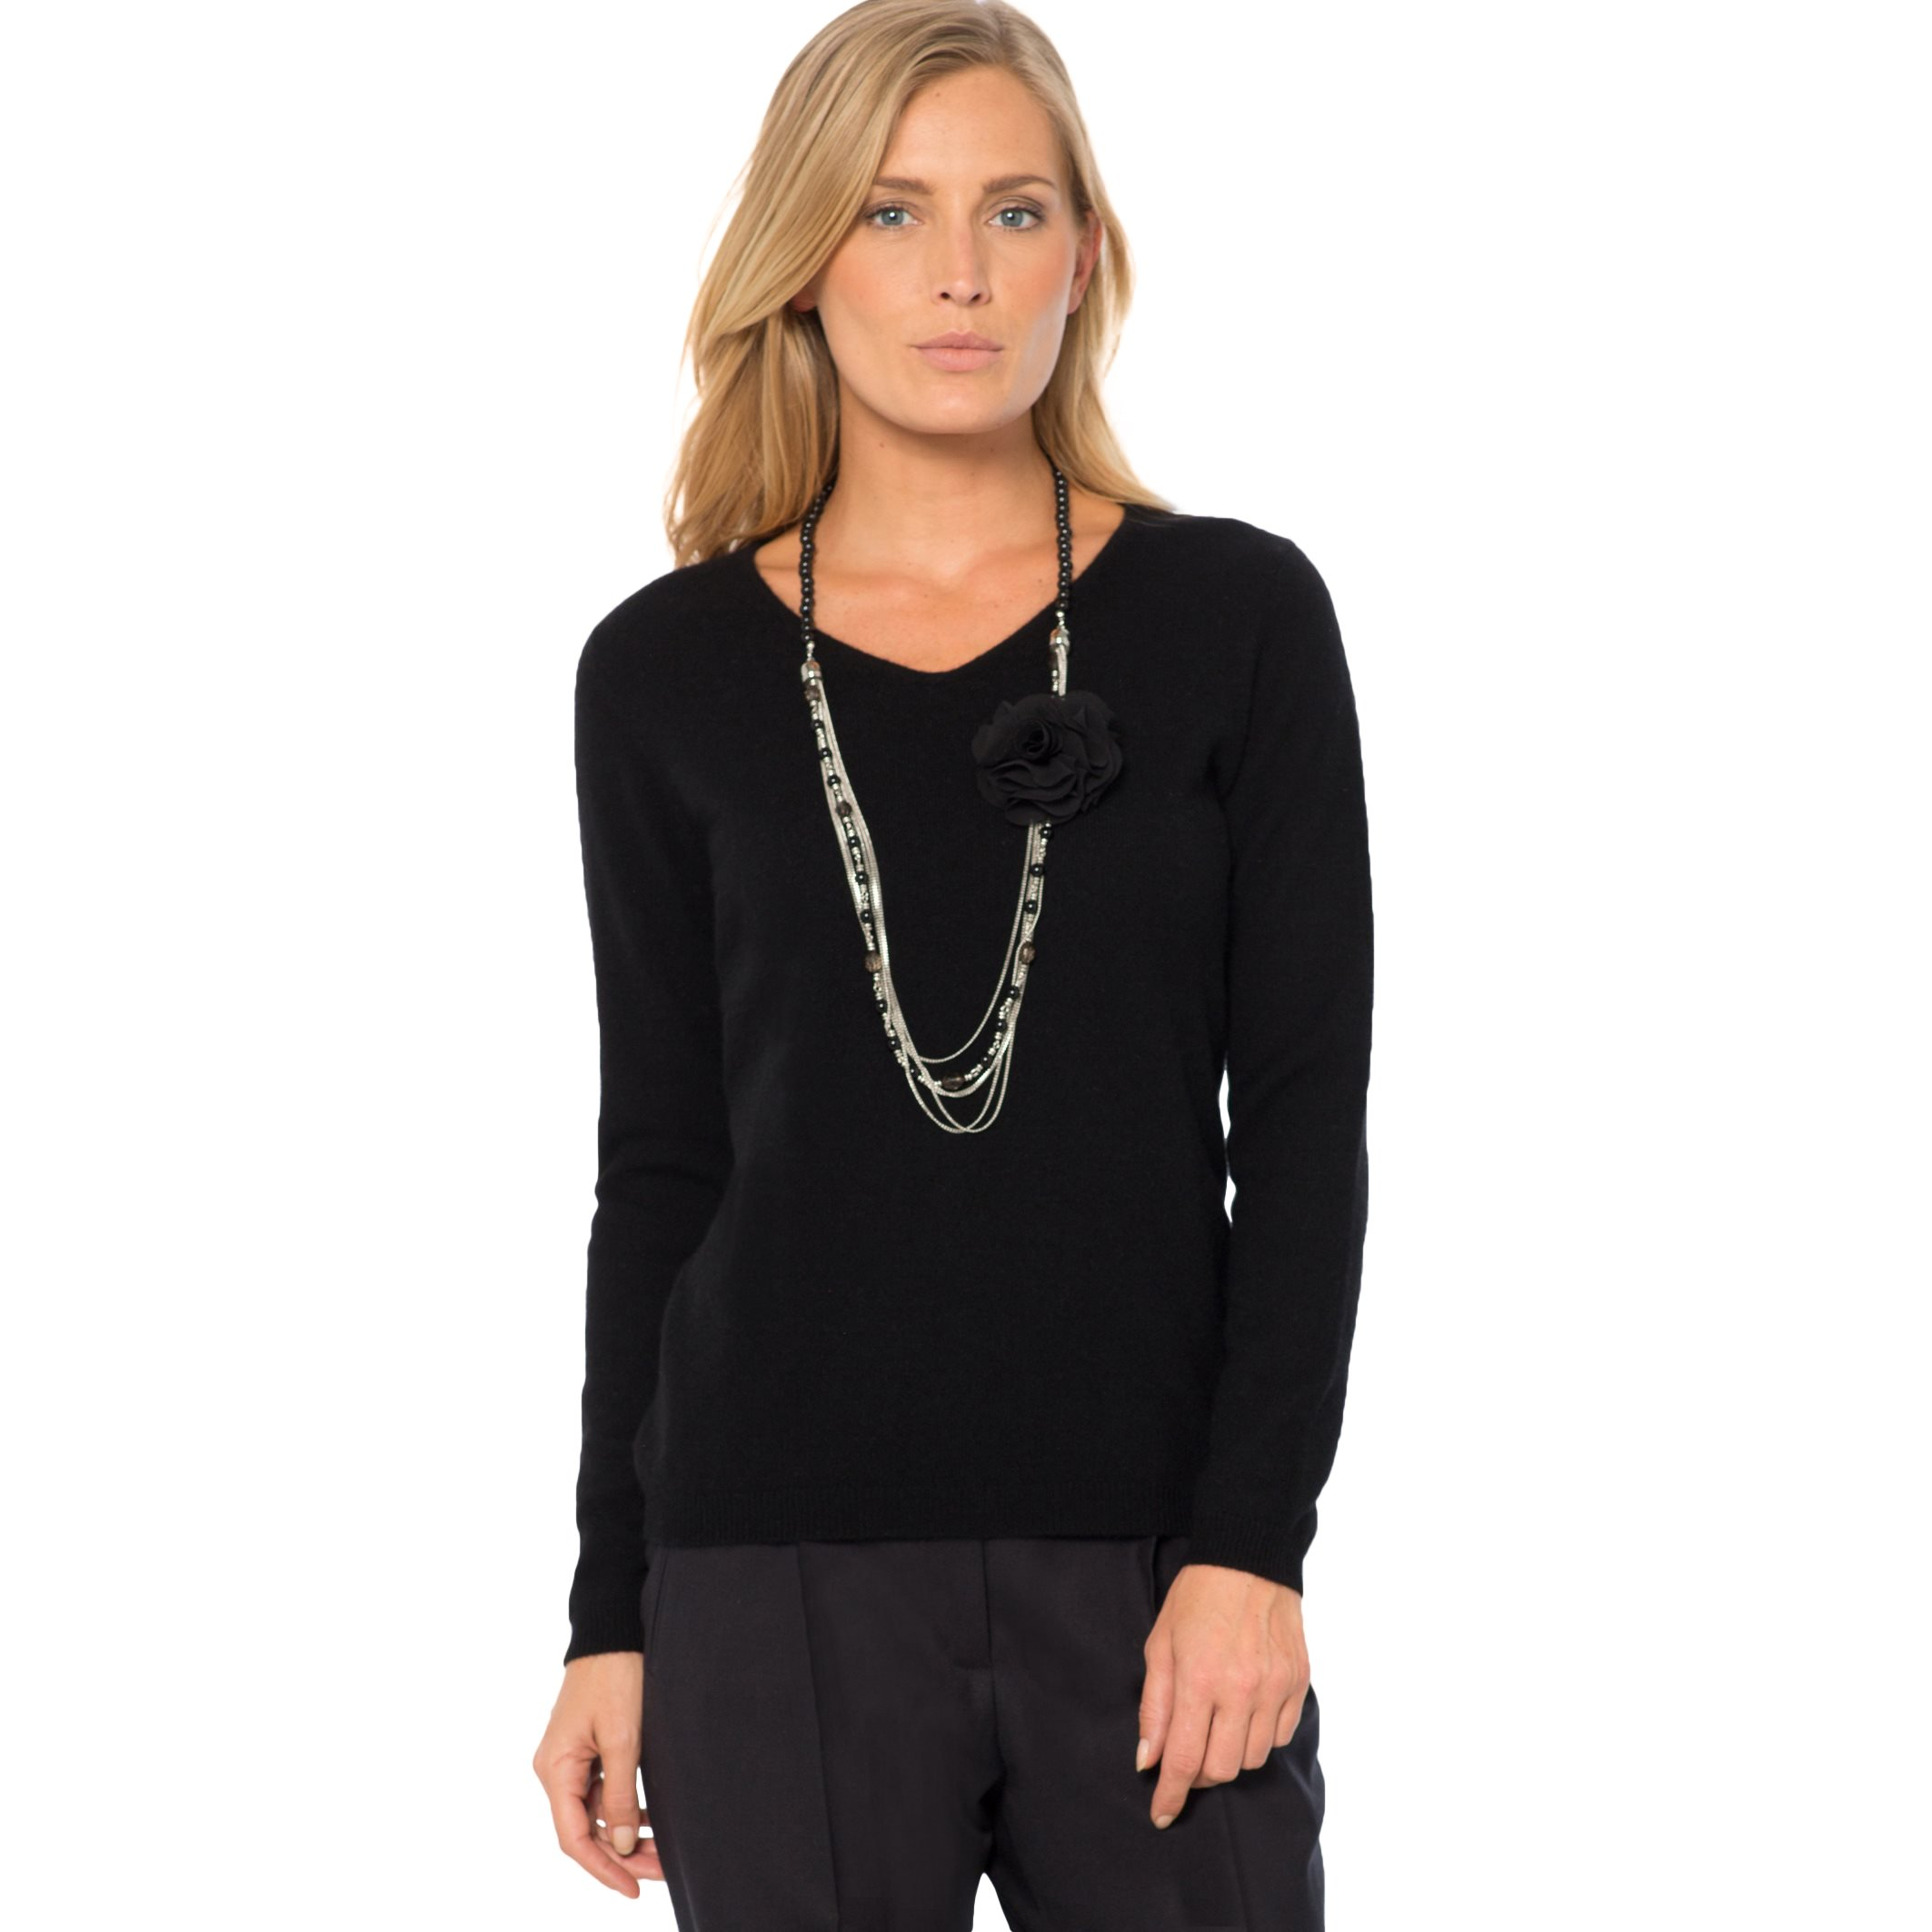 La Redoute Womens Fine Knit Cashmere V-Neck Jumper/Sweater Black Size Us 16/18 - Fr 46/48 by La Redoute (Image #1)